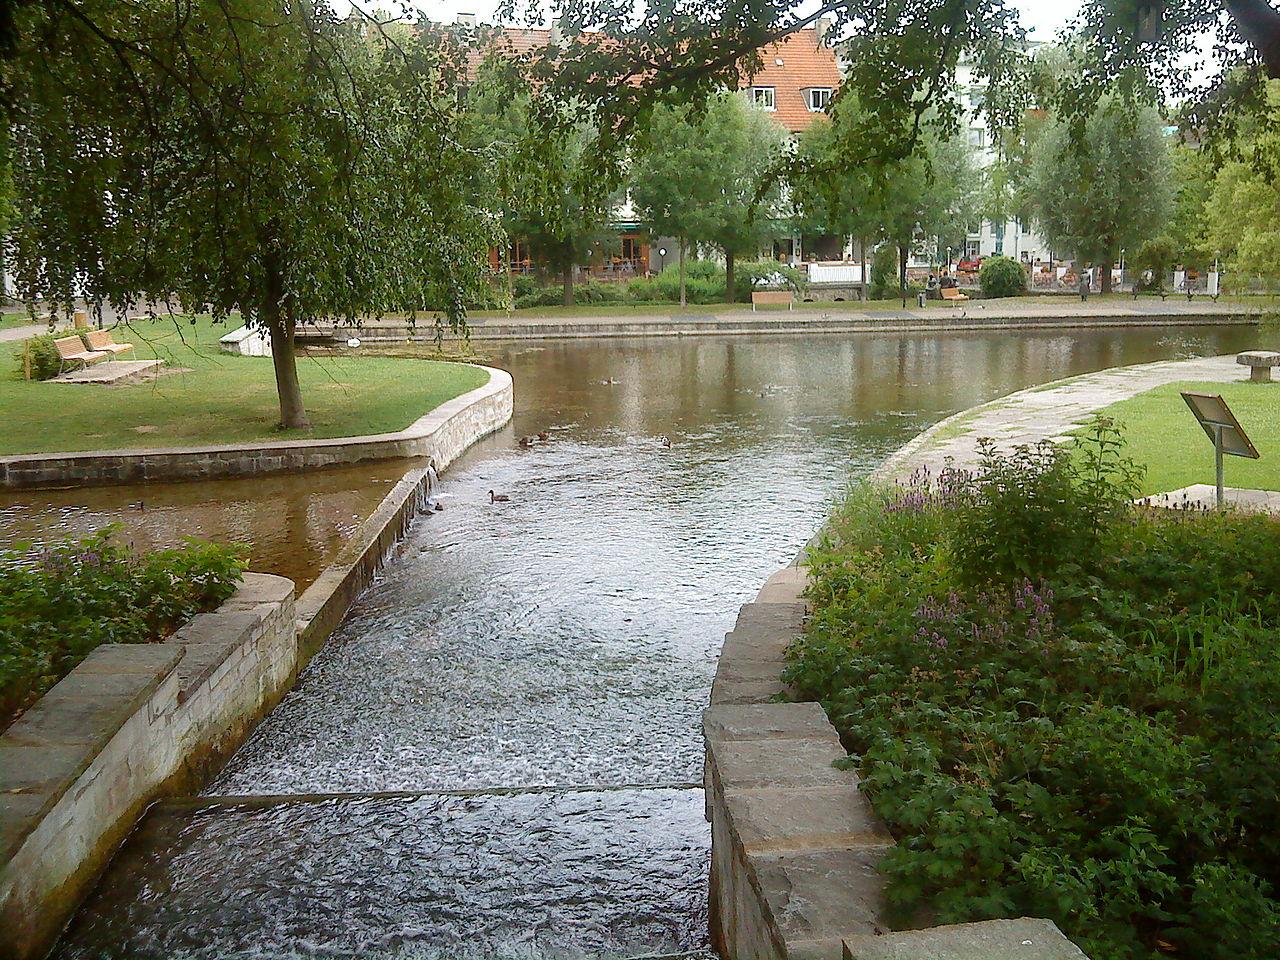 Bild Paderquellgebiet Paderborn